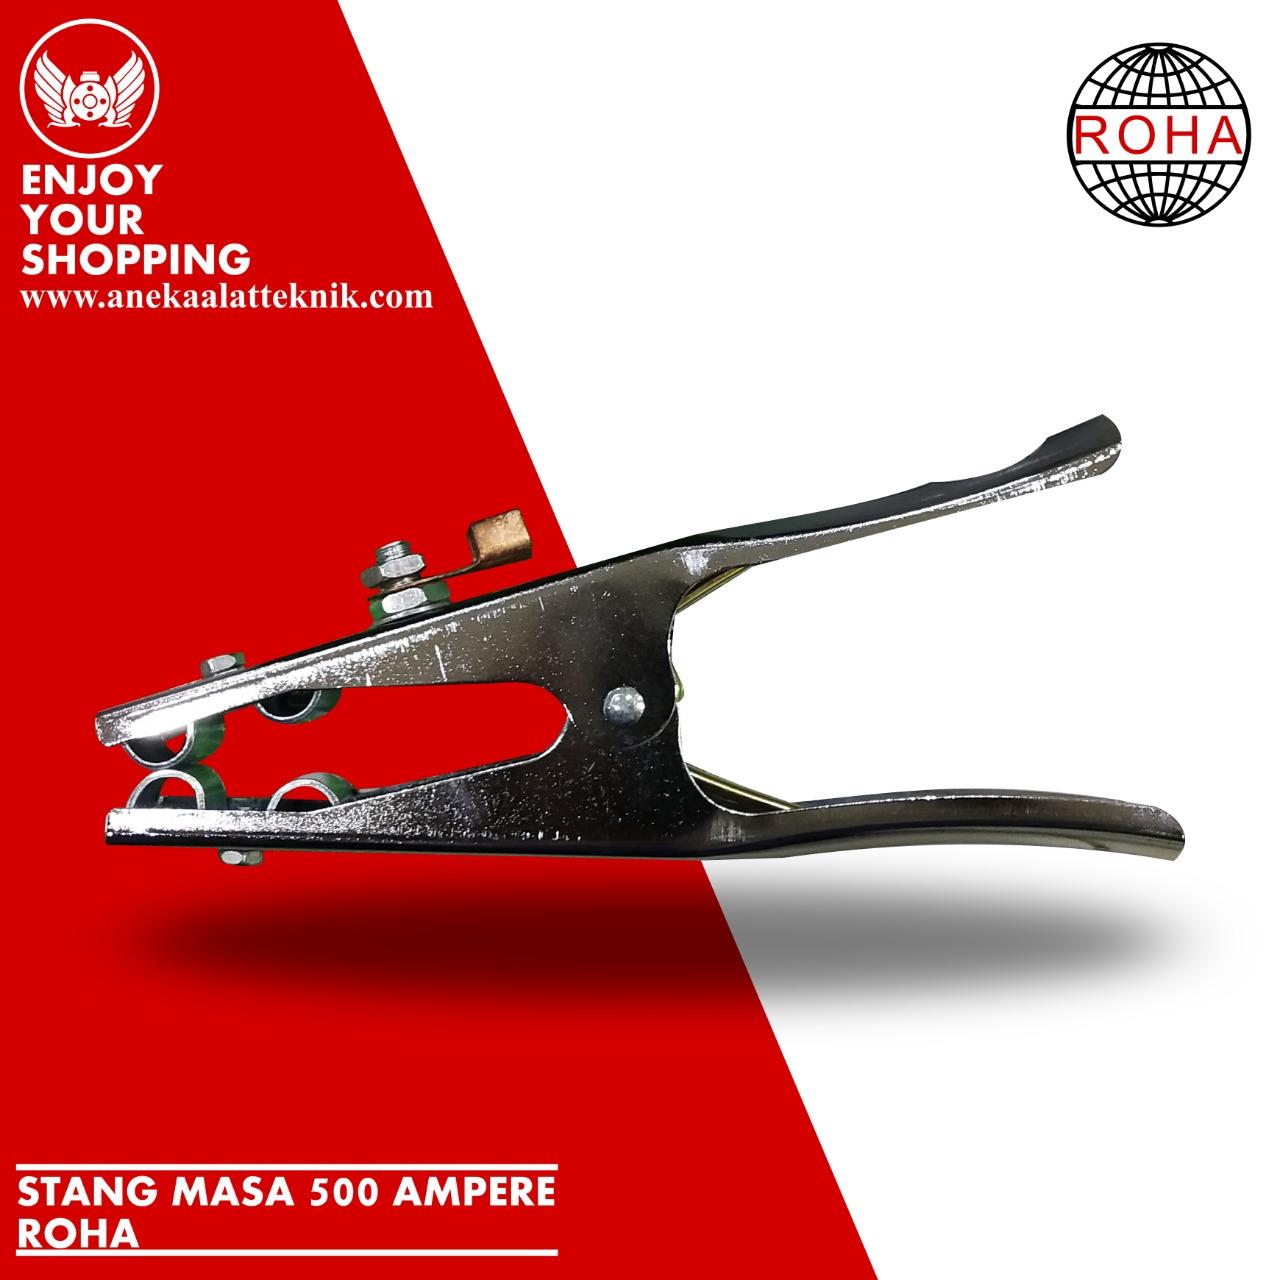 STANG MASA 500 AMPER ROHA